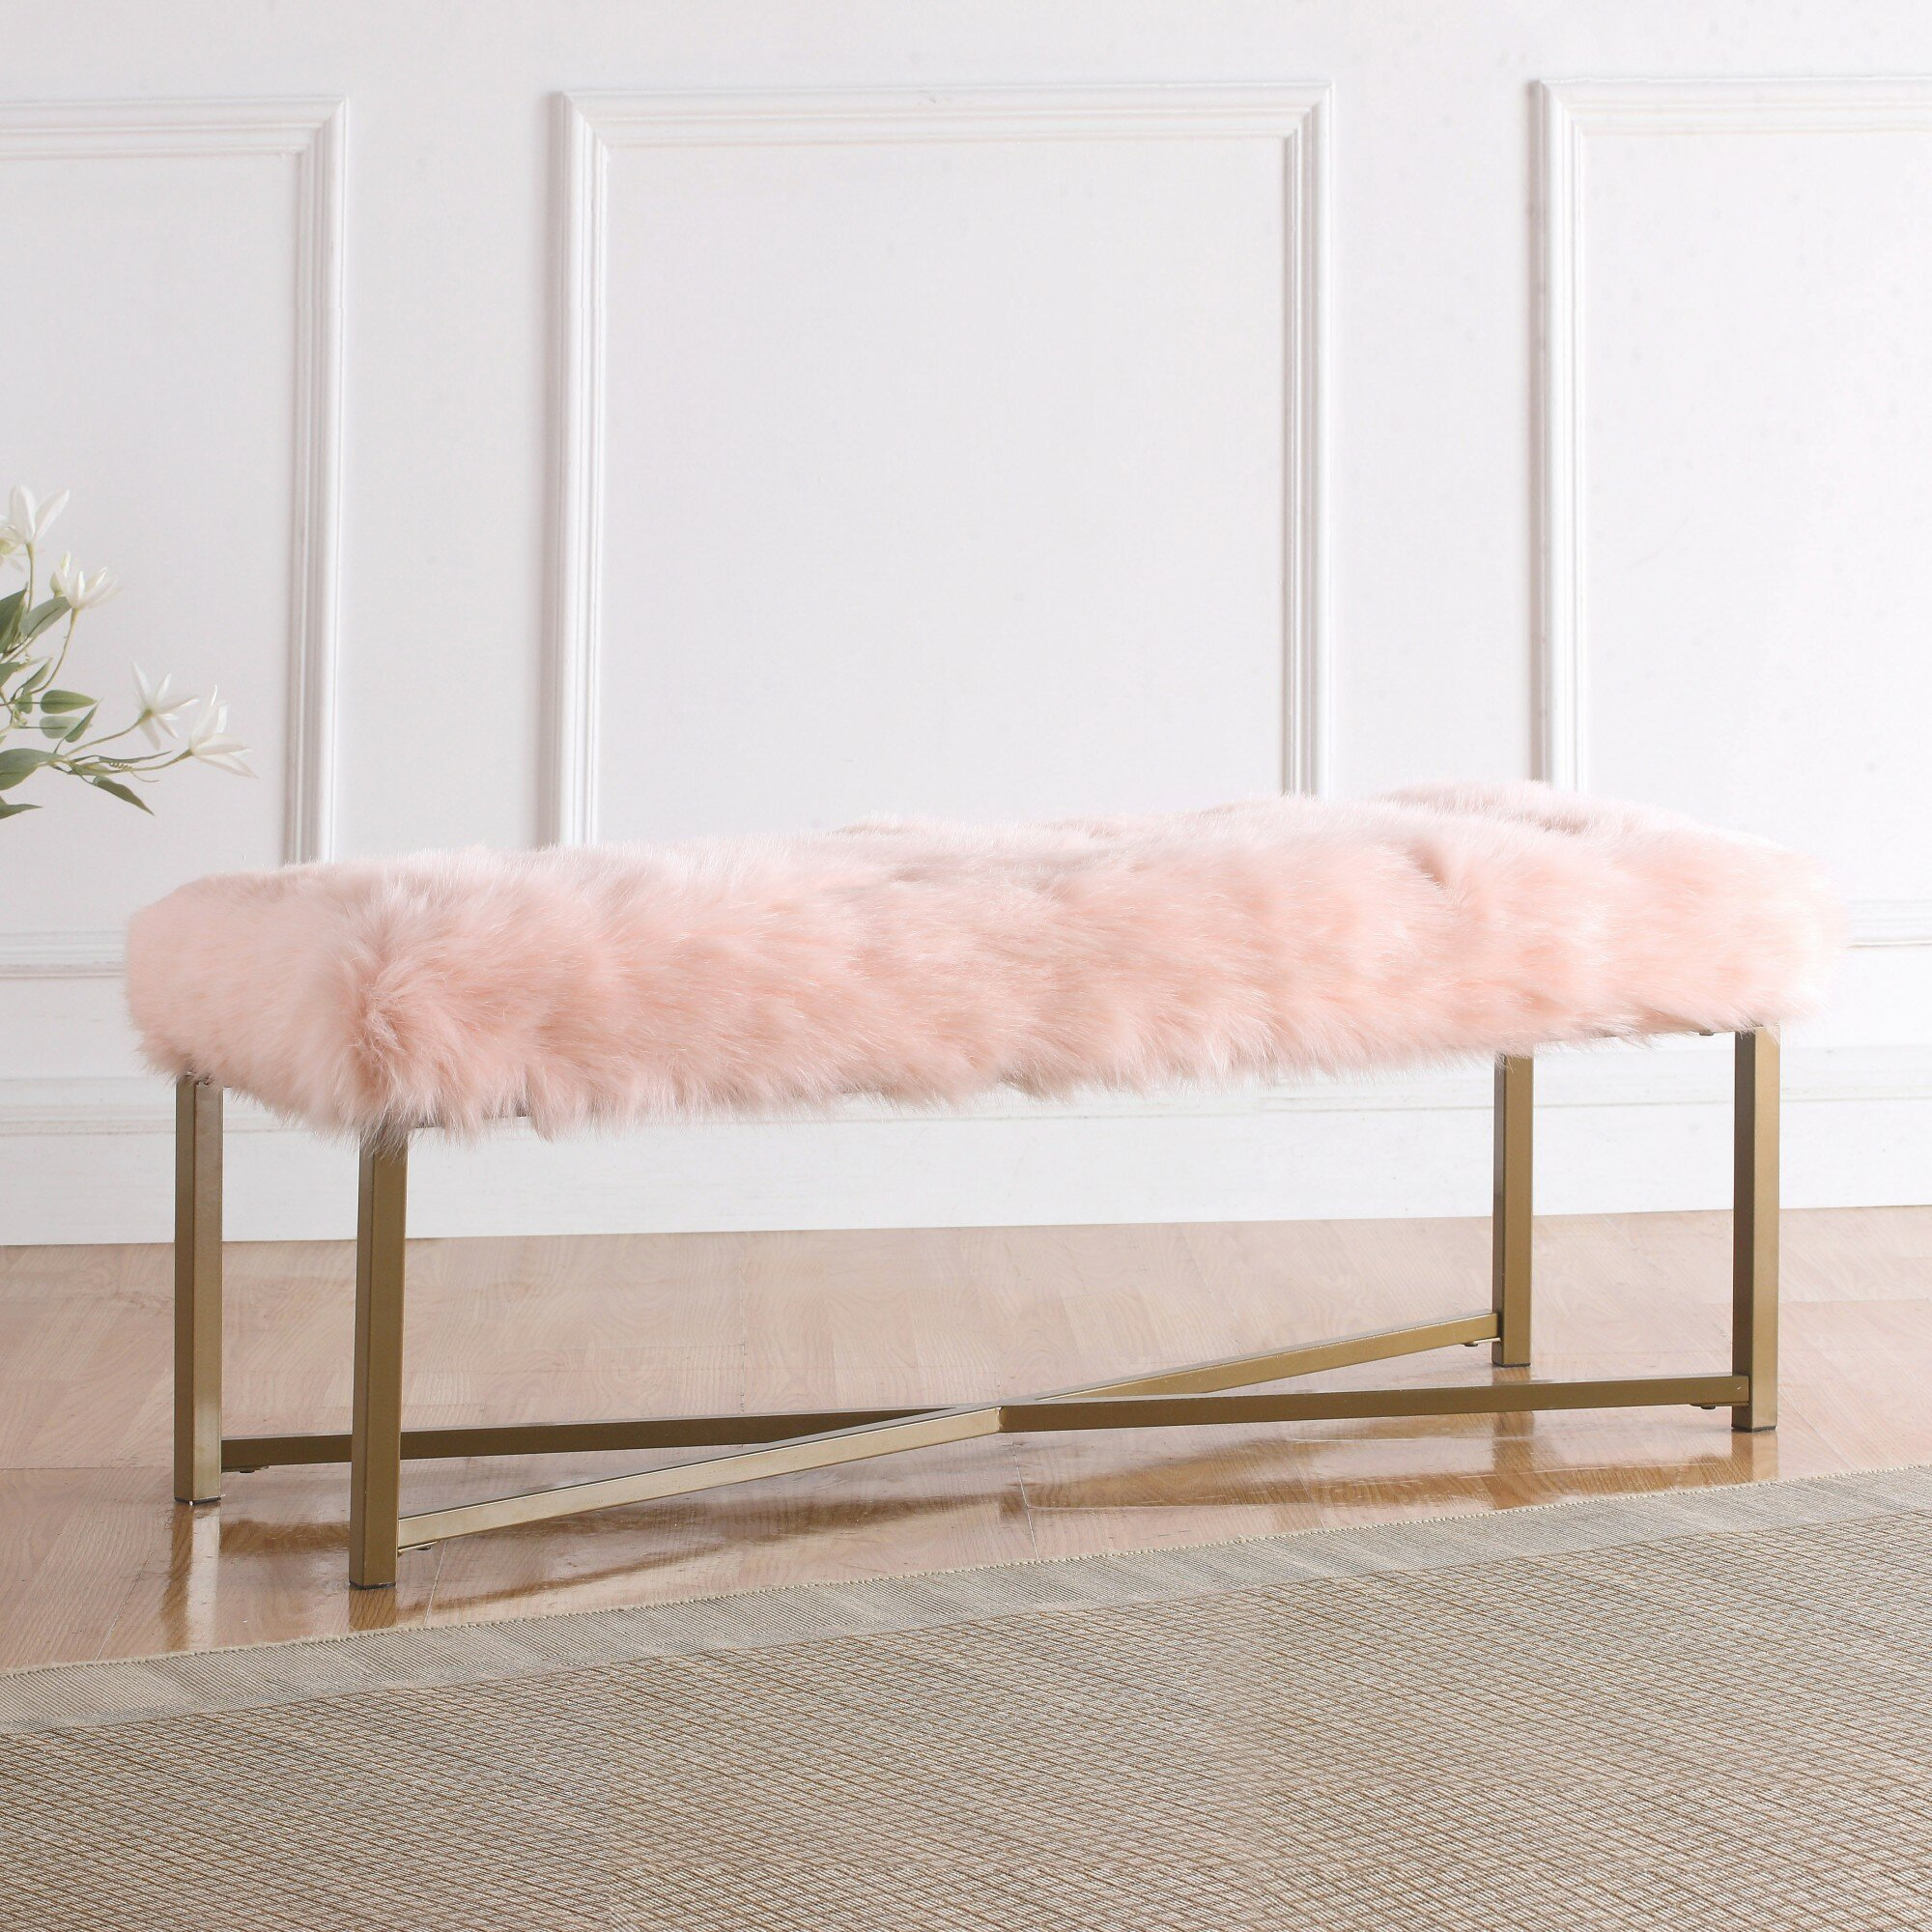 Willa Arlo Interiors Farley Fabric Bench & Reviews | Wayfair